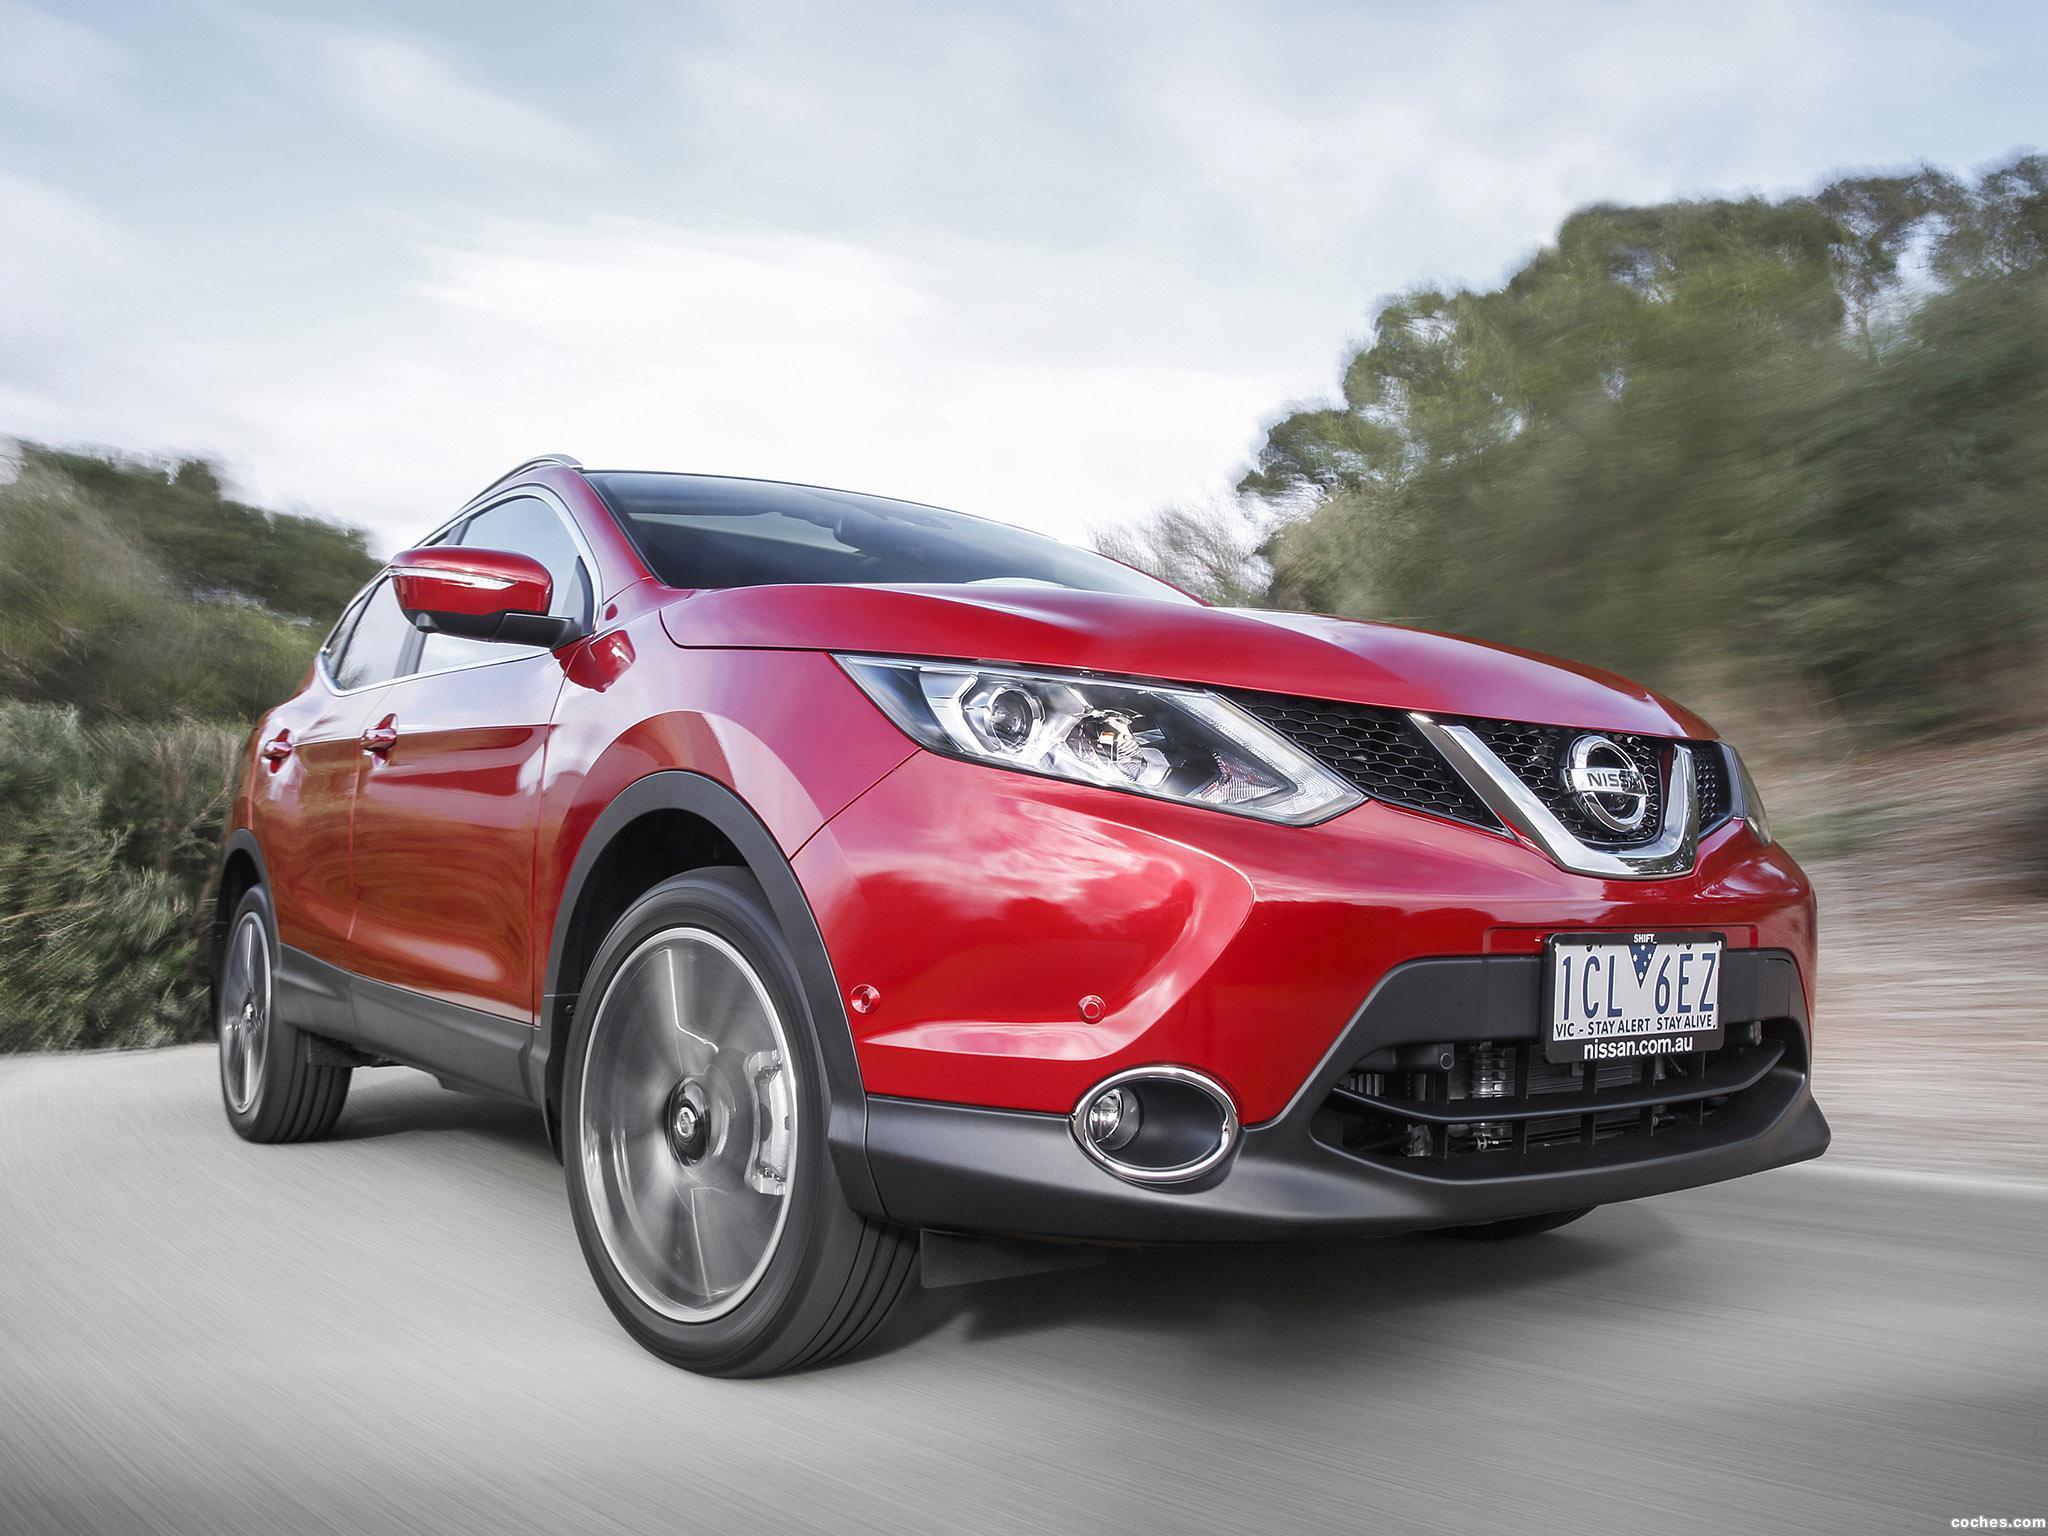 Foto 2 de Nissan Qashqai Australia 2014